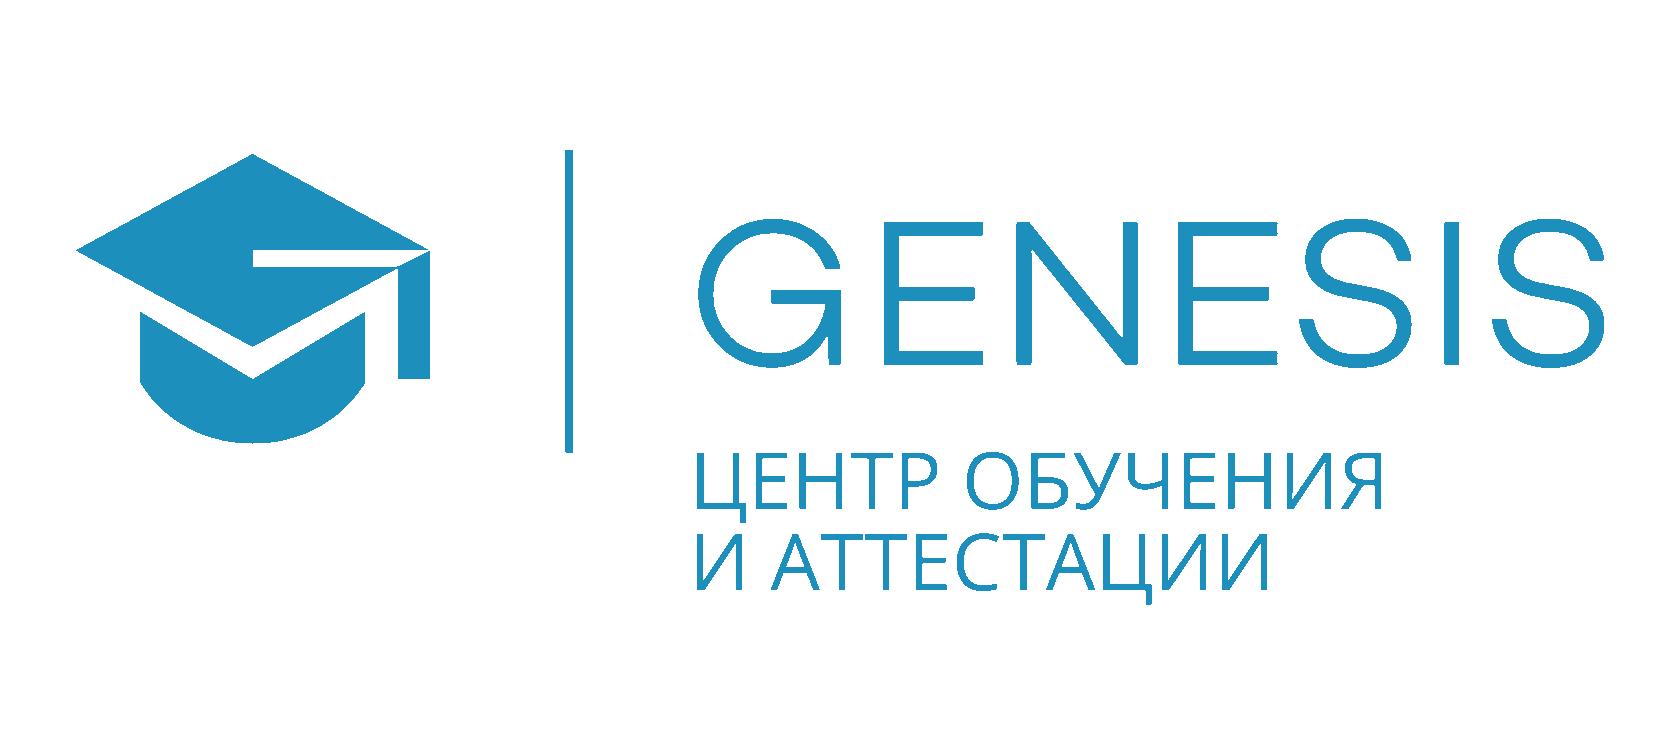 Центр обучения и аттестации Генезис